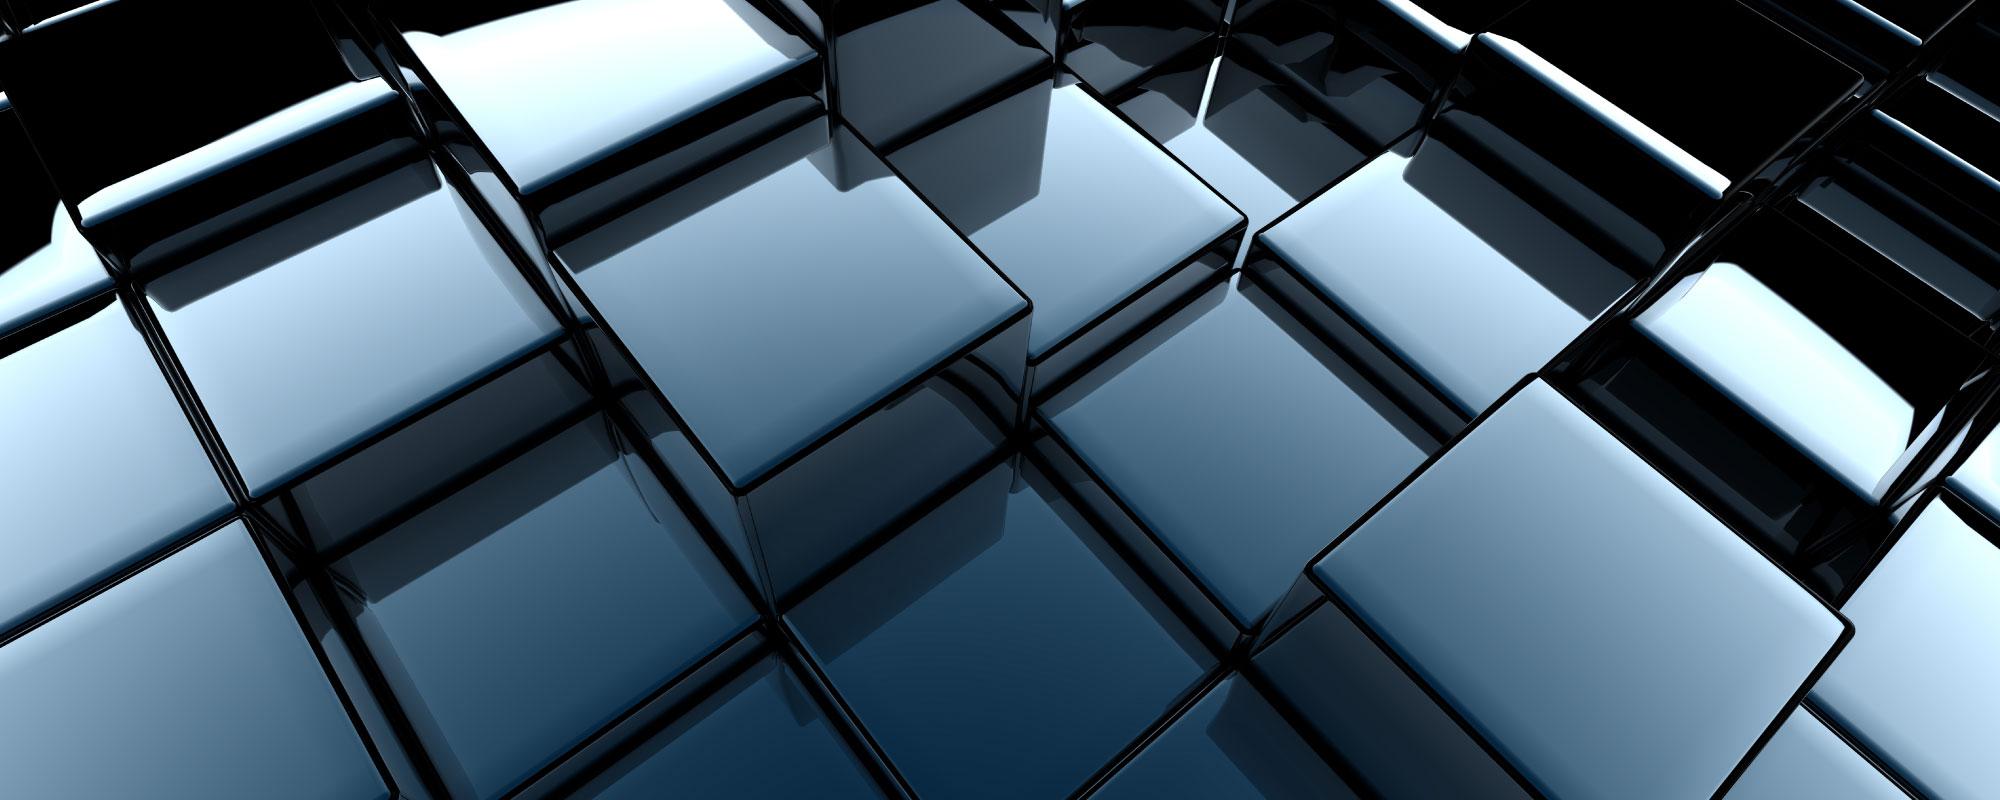 blackcube